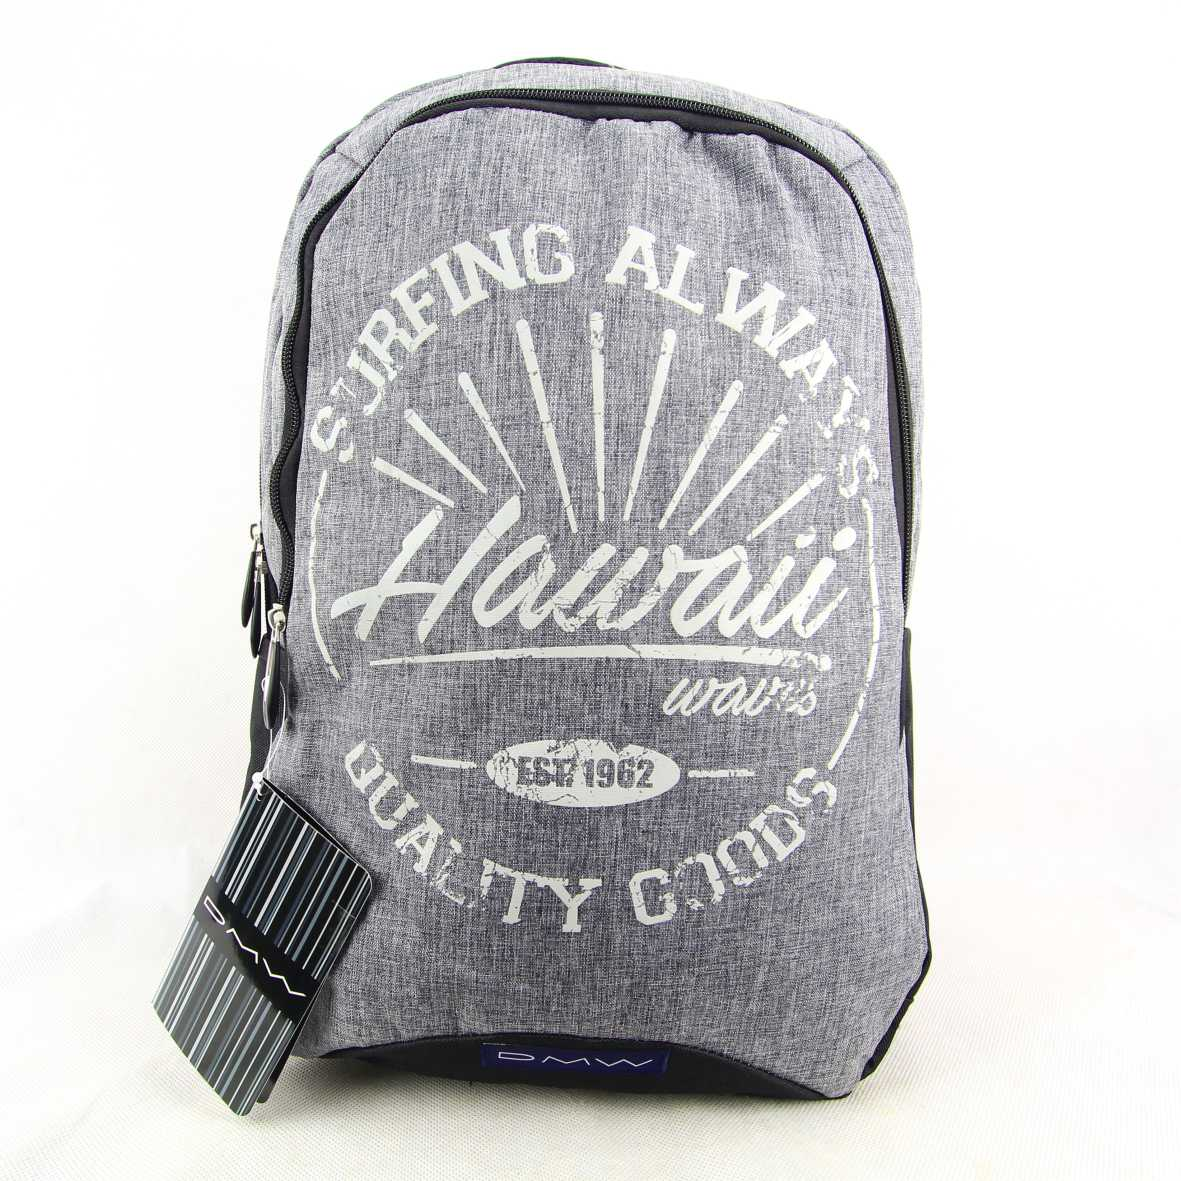 Mochila Surfing Always Hawaii Waves DMW Bags 11035